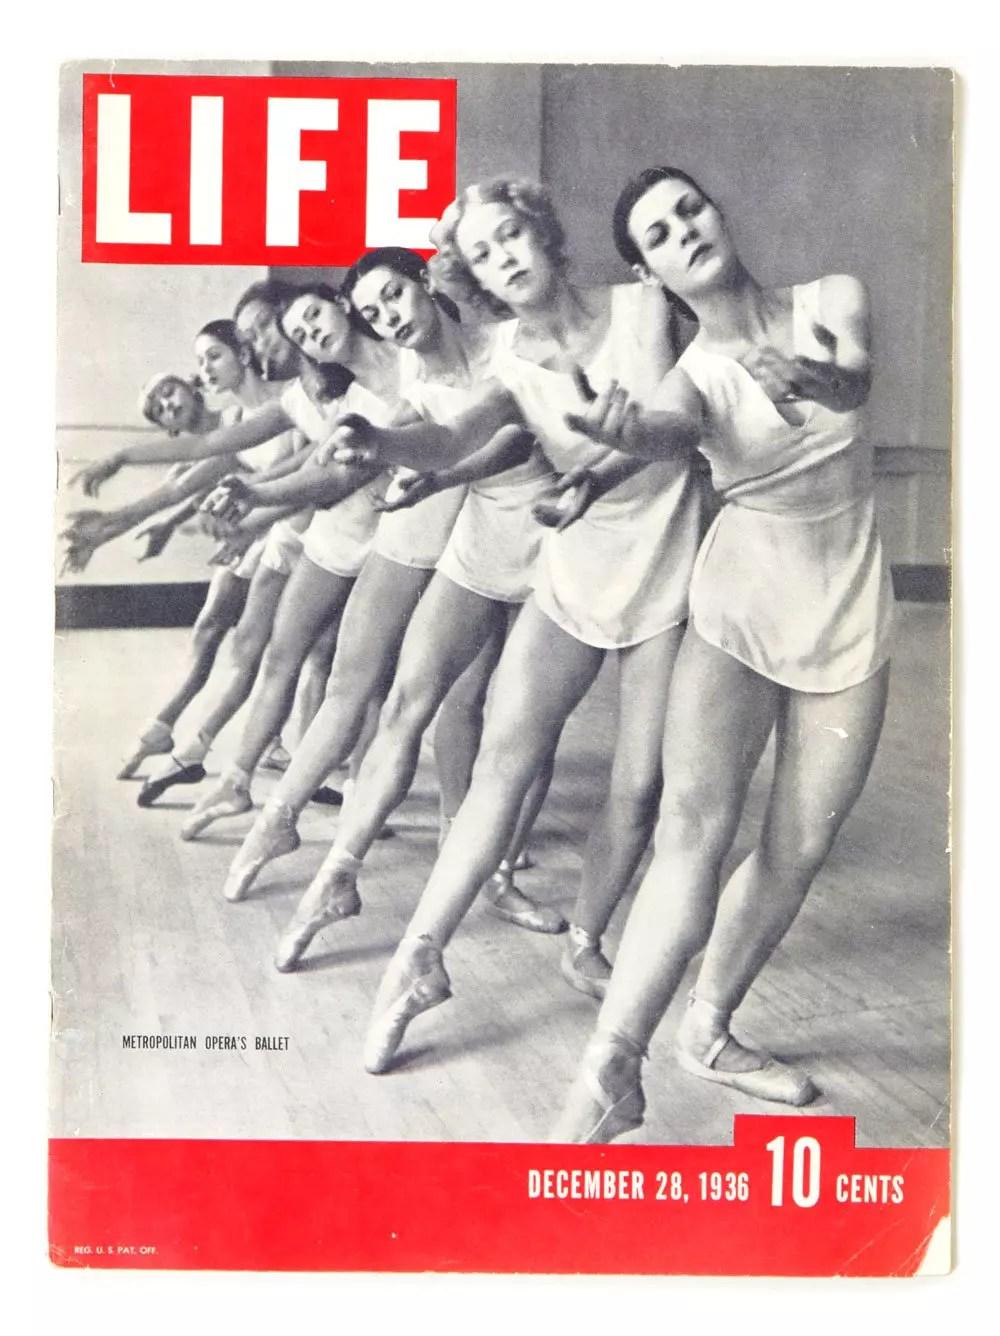 LIFE Magazine 1936 December 28 Metropolitan Opera's Ballet